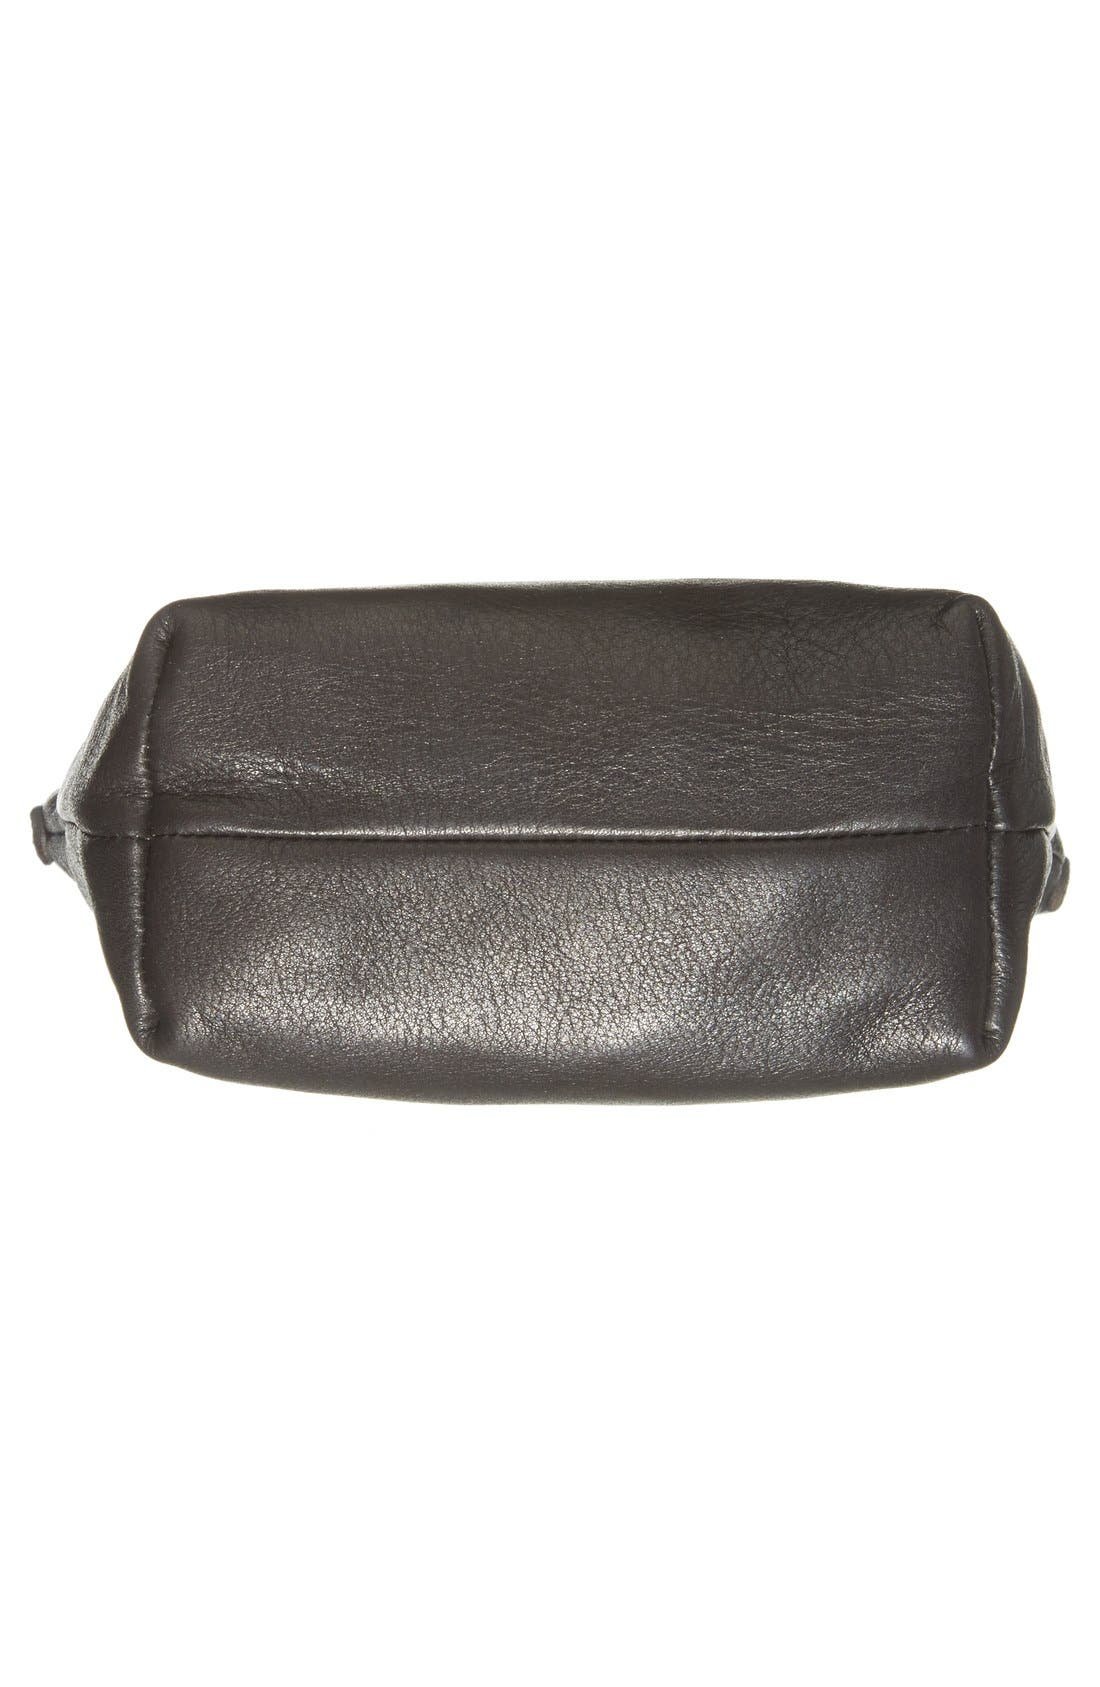 BAGGU,                              Leather Crossbody Bag,                             Alternate thumbnail 6, color,                             004